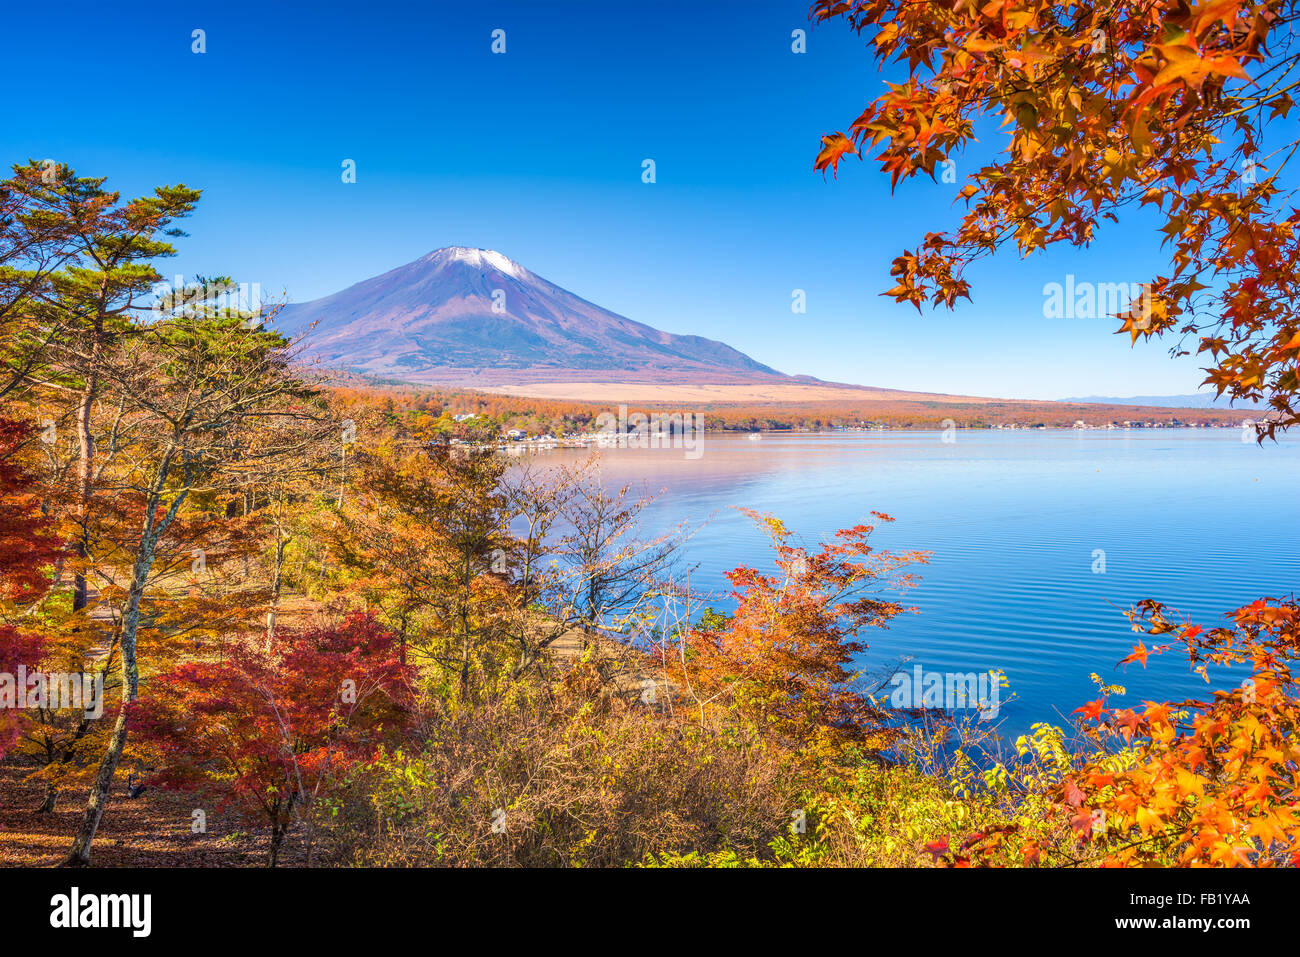 Mt. Fuji, Giappone da Yamanaka Lake in autunno. Immagini Stock